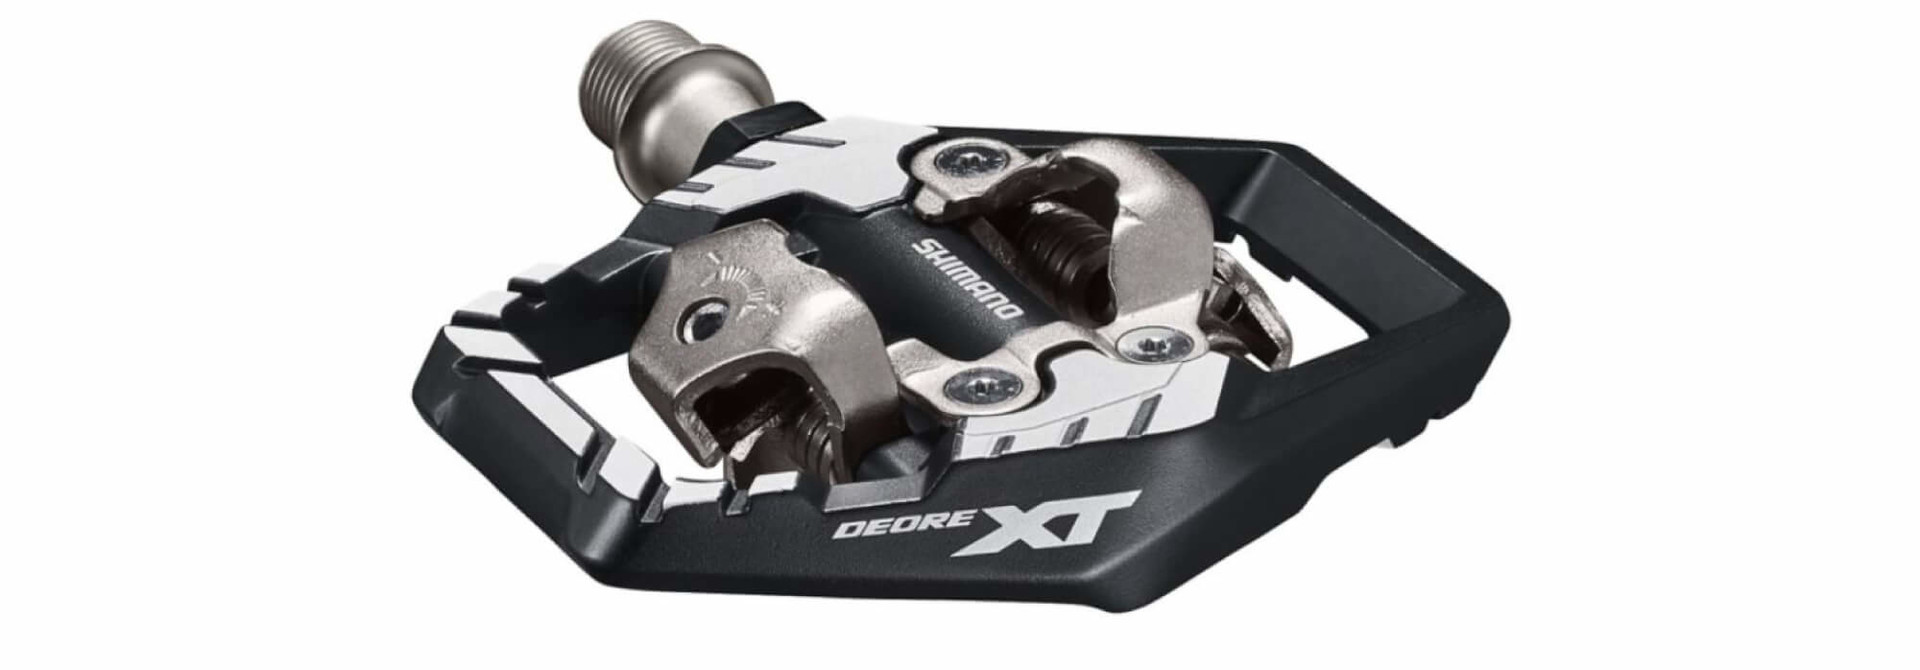 PD-M8120 SPD Pedals Deore XT Trail